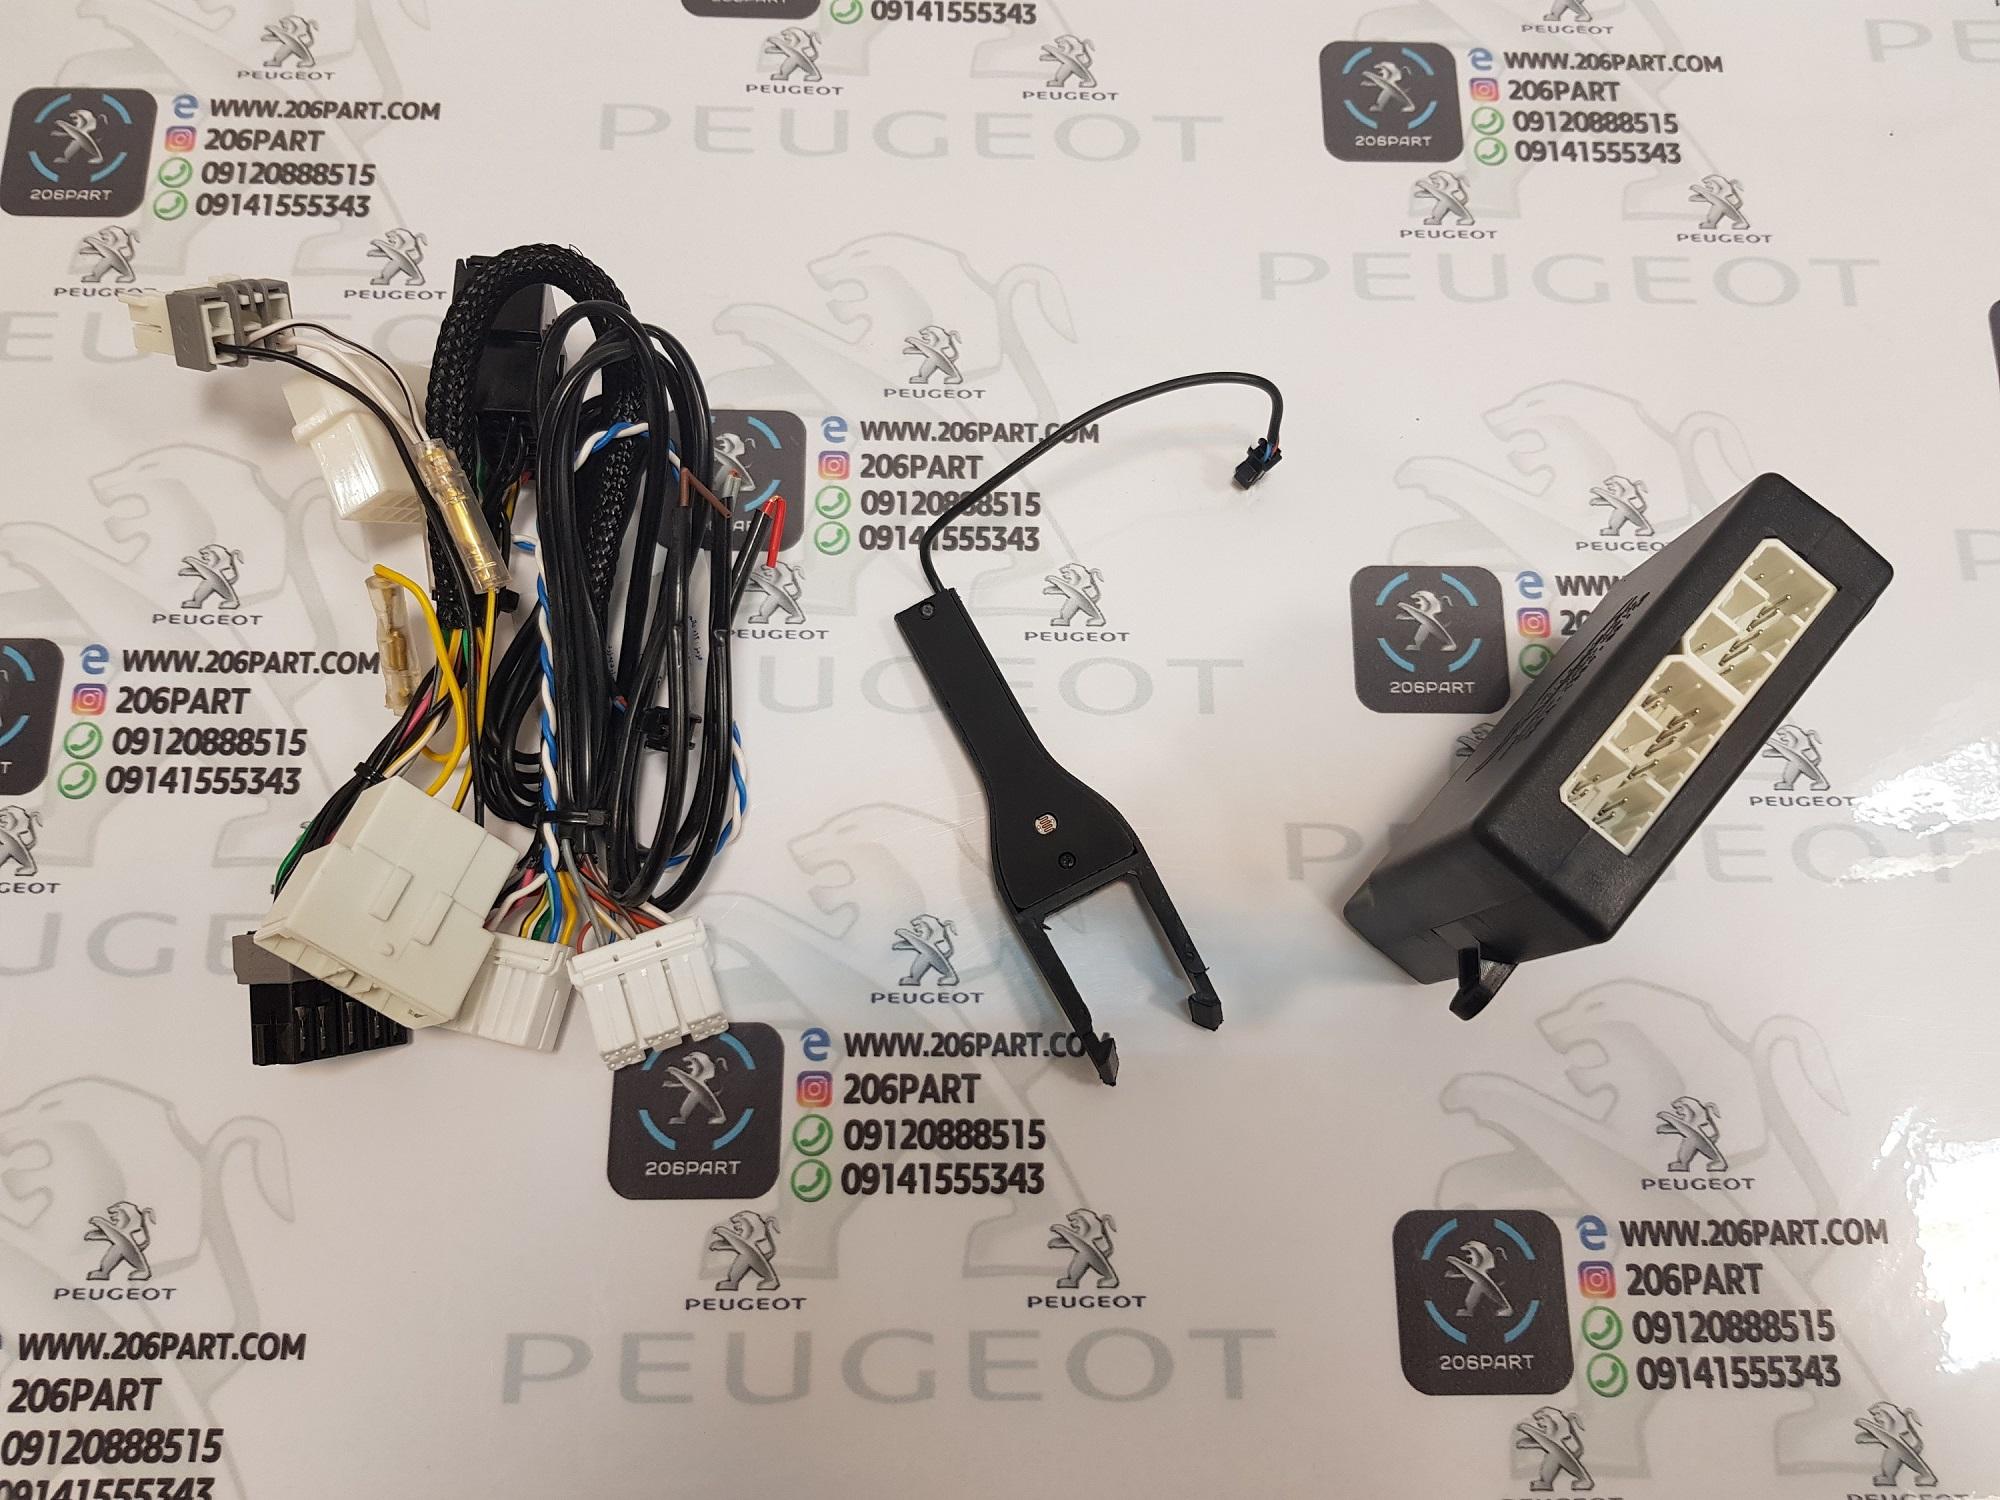 سنسور نور / ریموت هوشمند ASSISTANT CONNECTED DRIVE (مخصوص 206 و 207 مدل 92 به بعد)